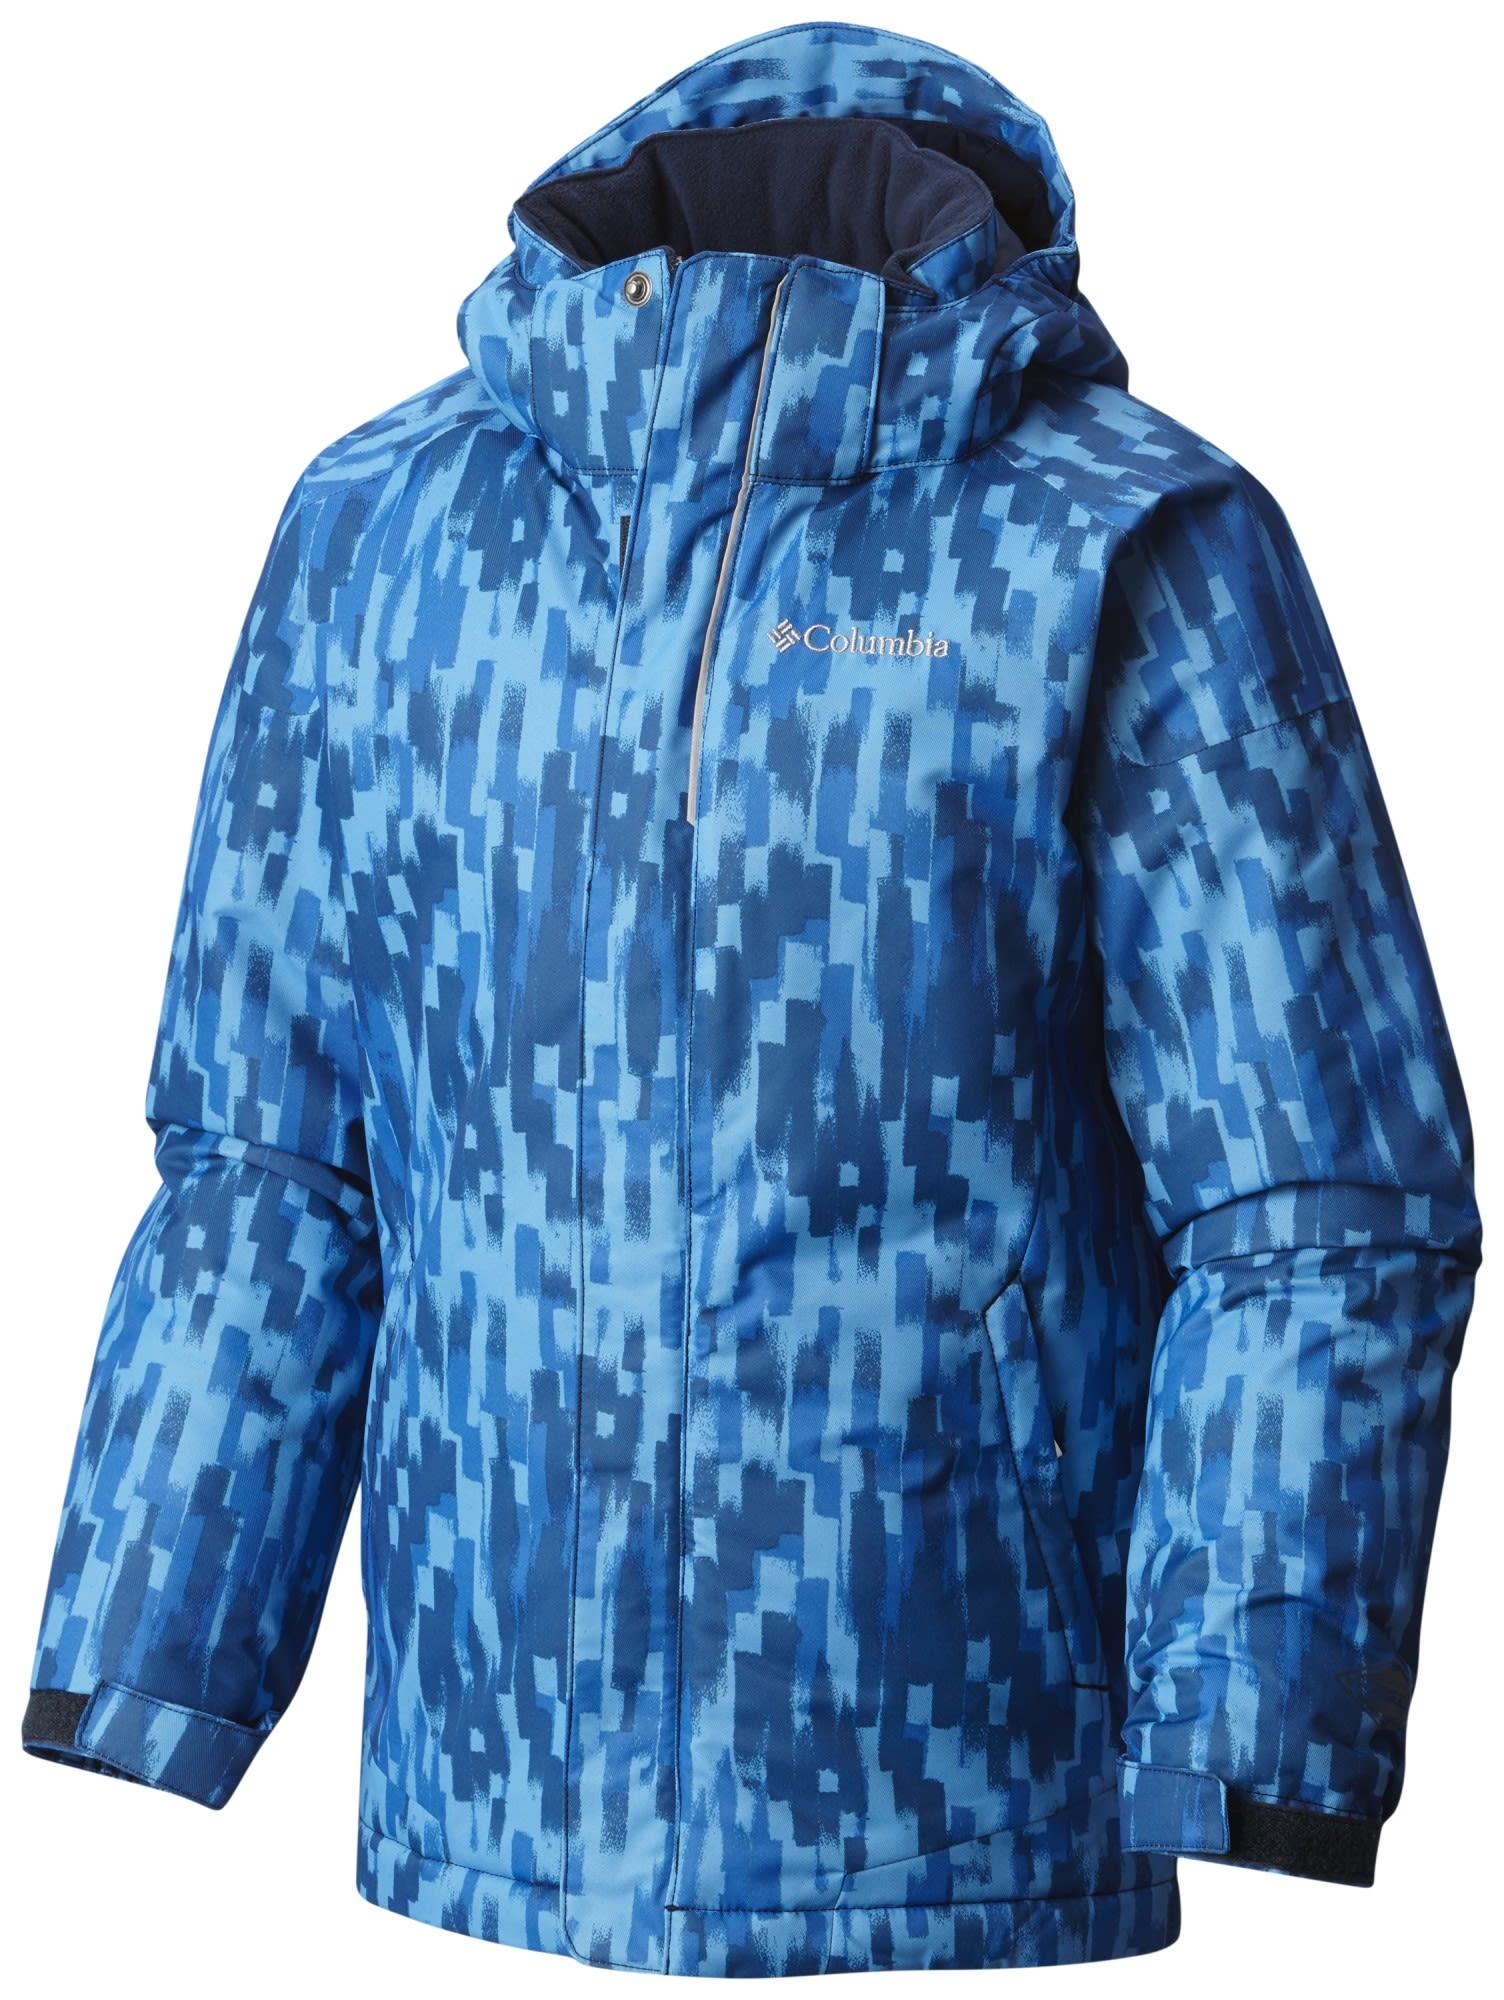 Columbia Boys Twist Tip Jacket Blau, Male L -Farbe Peninsula Brushed Strokes Pri